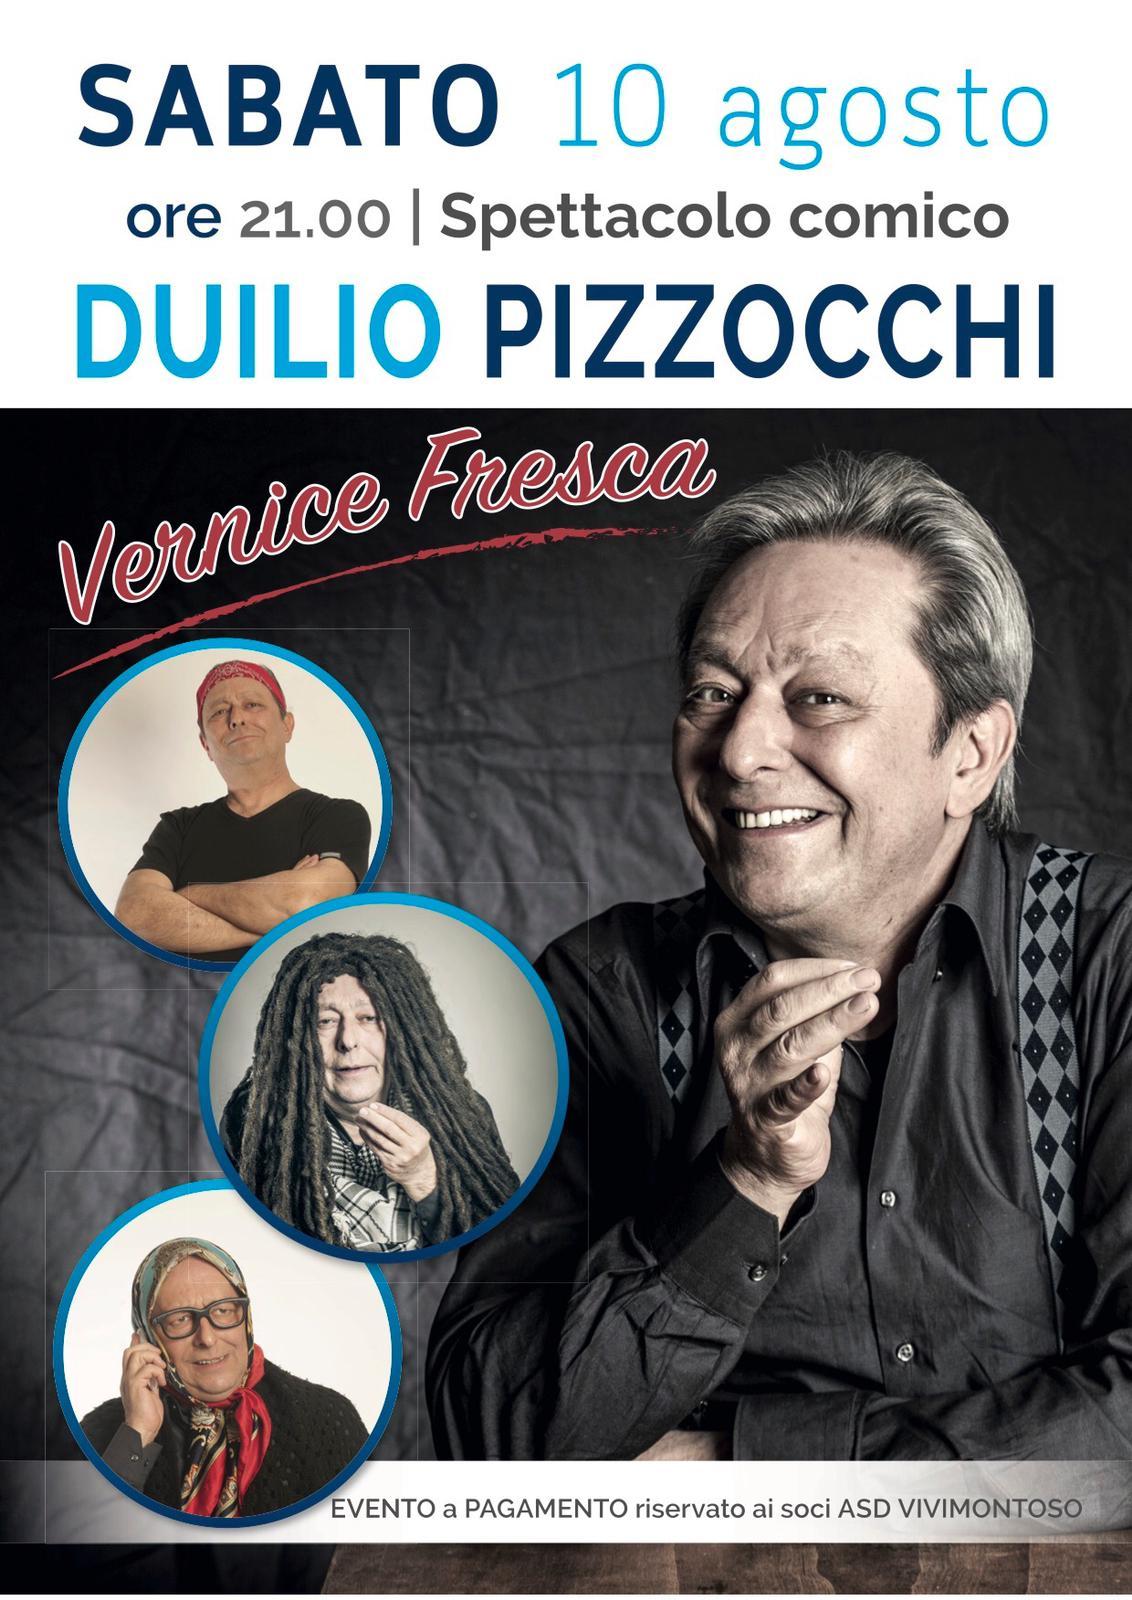 Vernice fresca – Duilio Pizzocchi